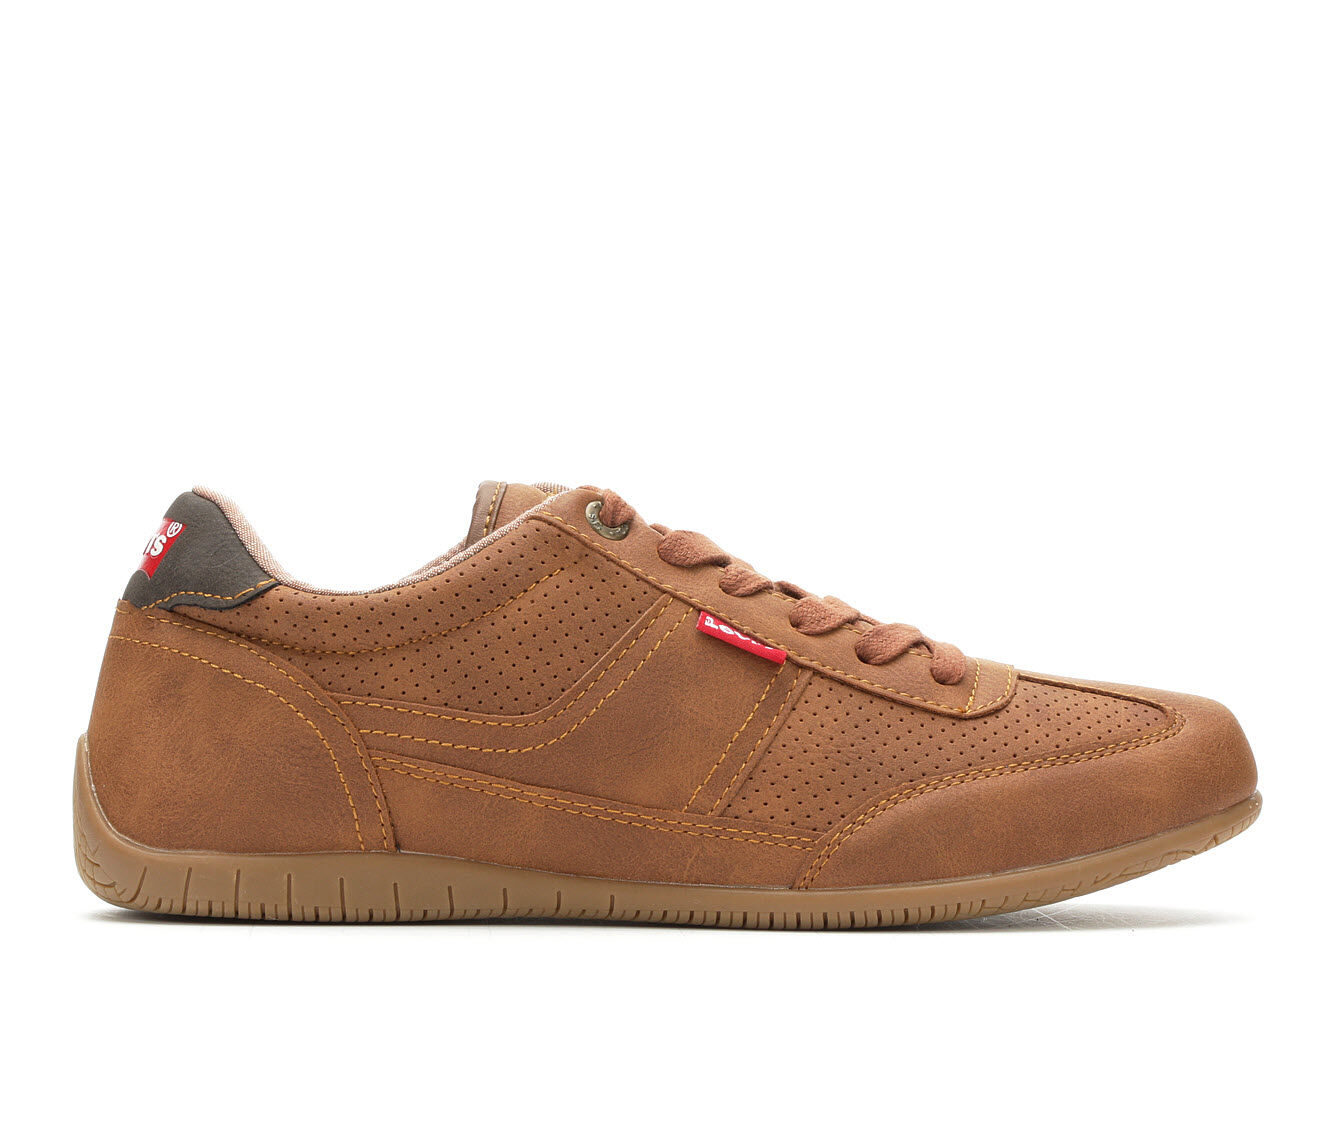 uk shoes_kd1775